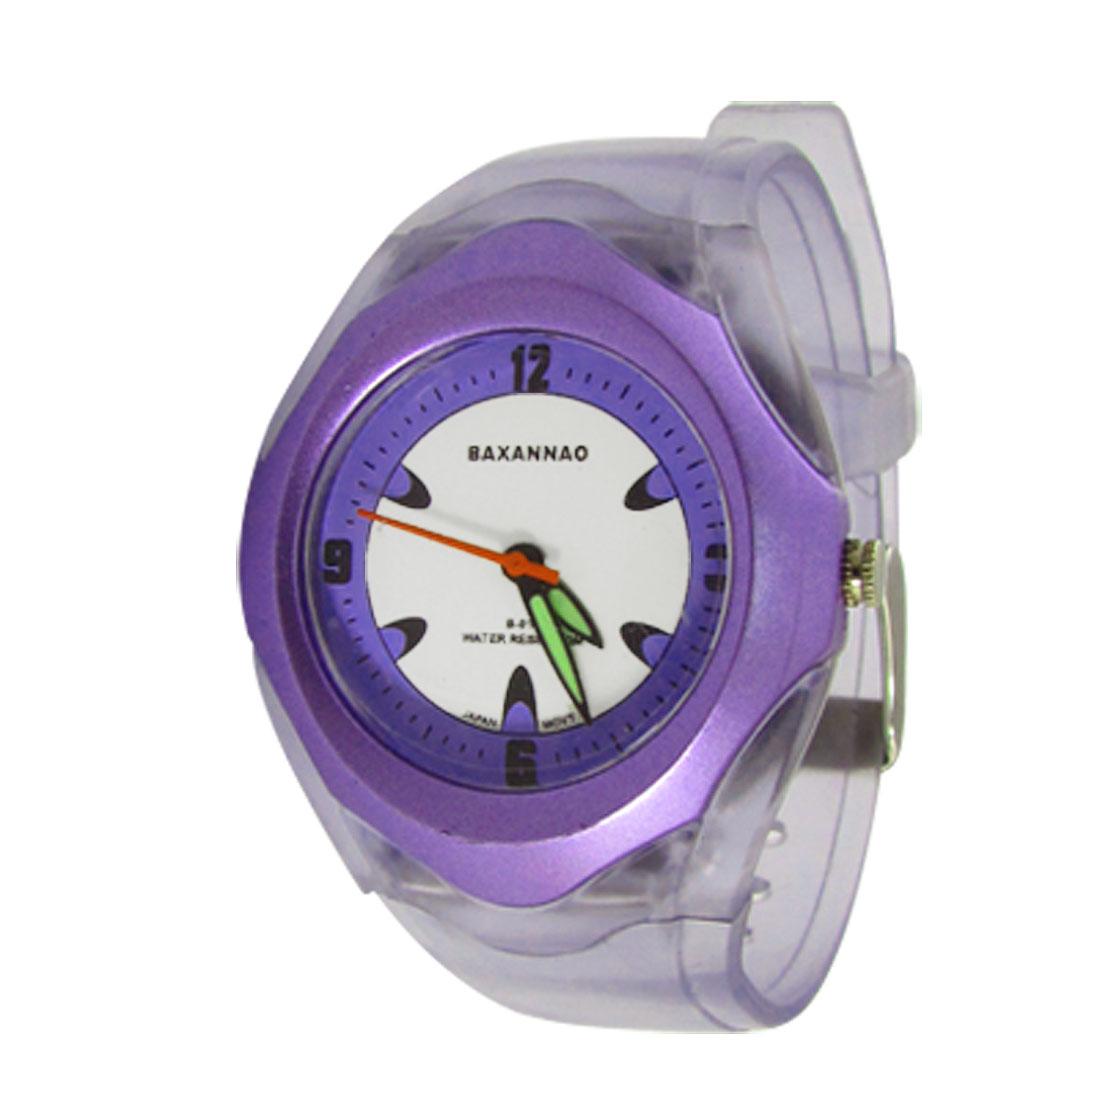 Light Purple Plastic Band Luminous Watch Hand Wristwatch for Children